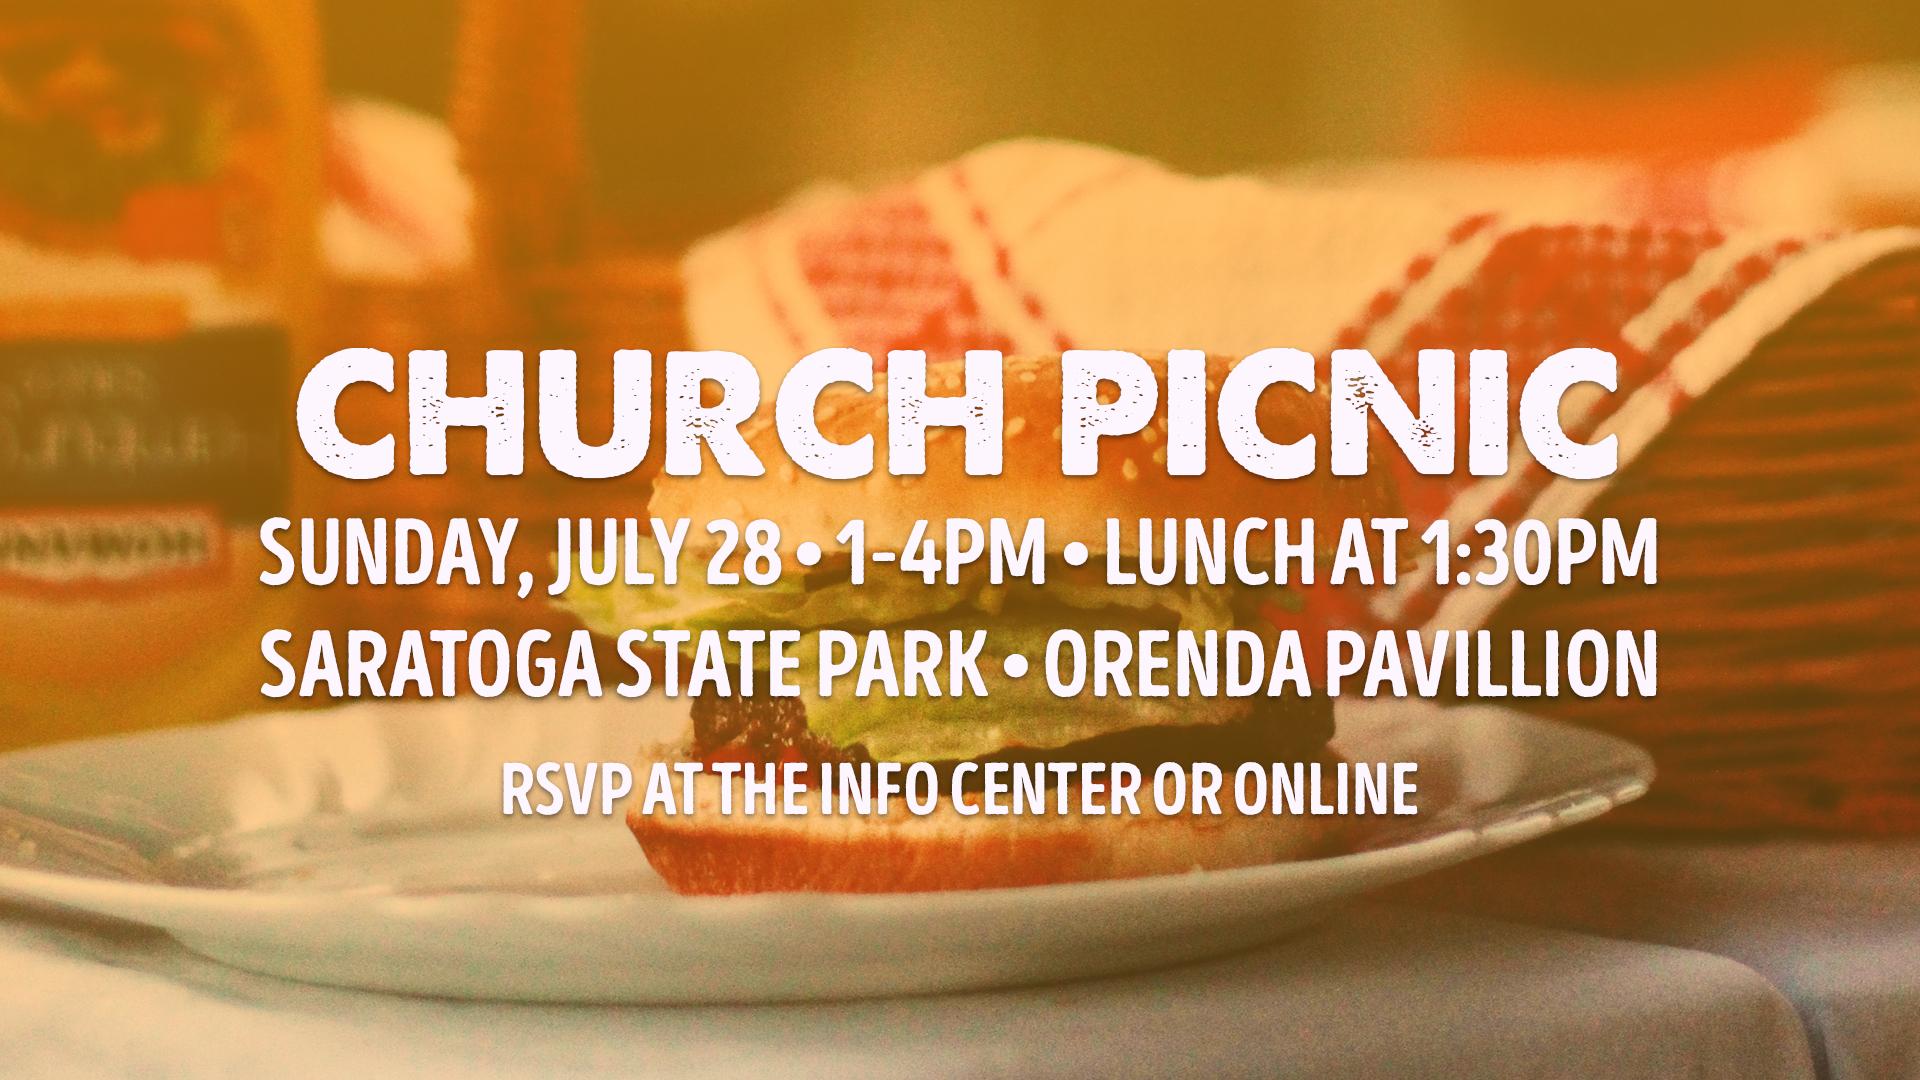 Church Picnic-Sunday, July 28th